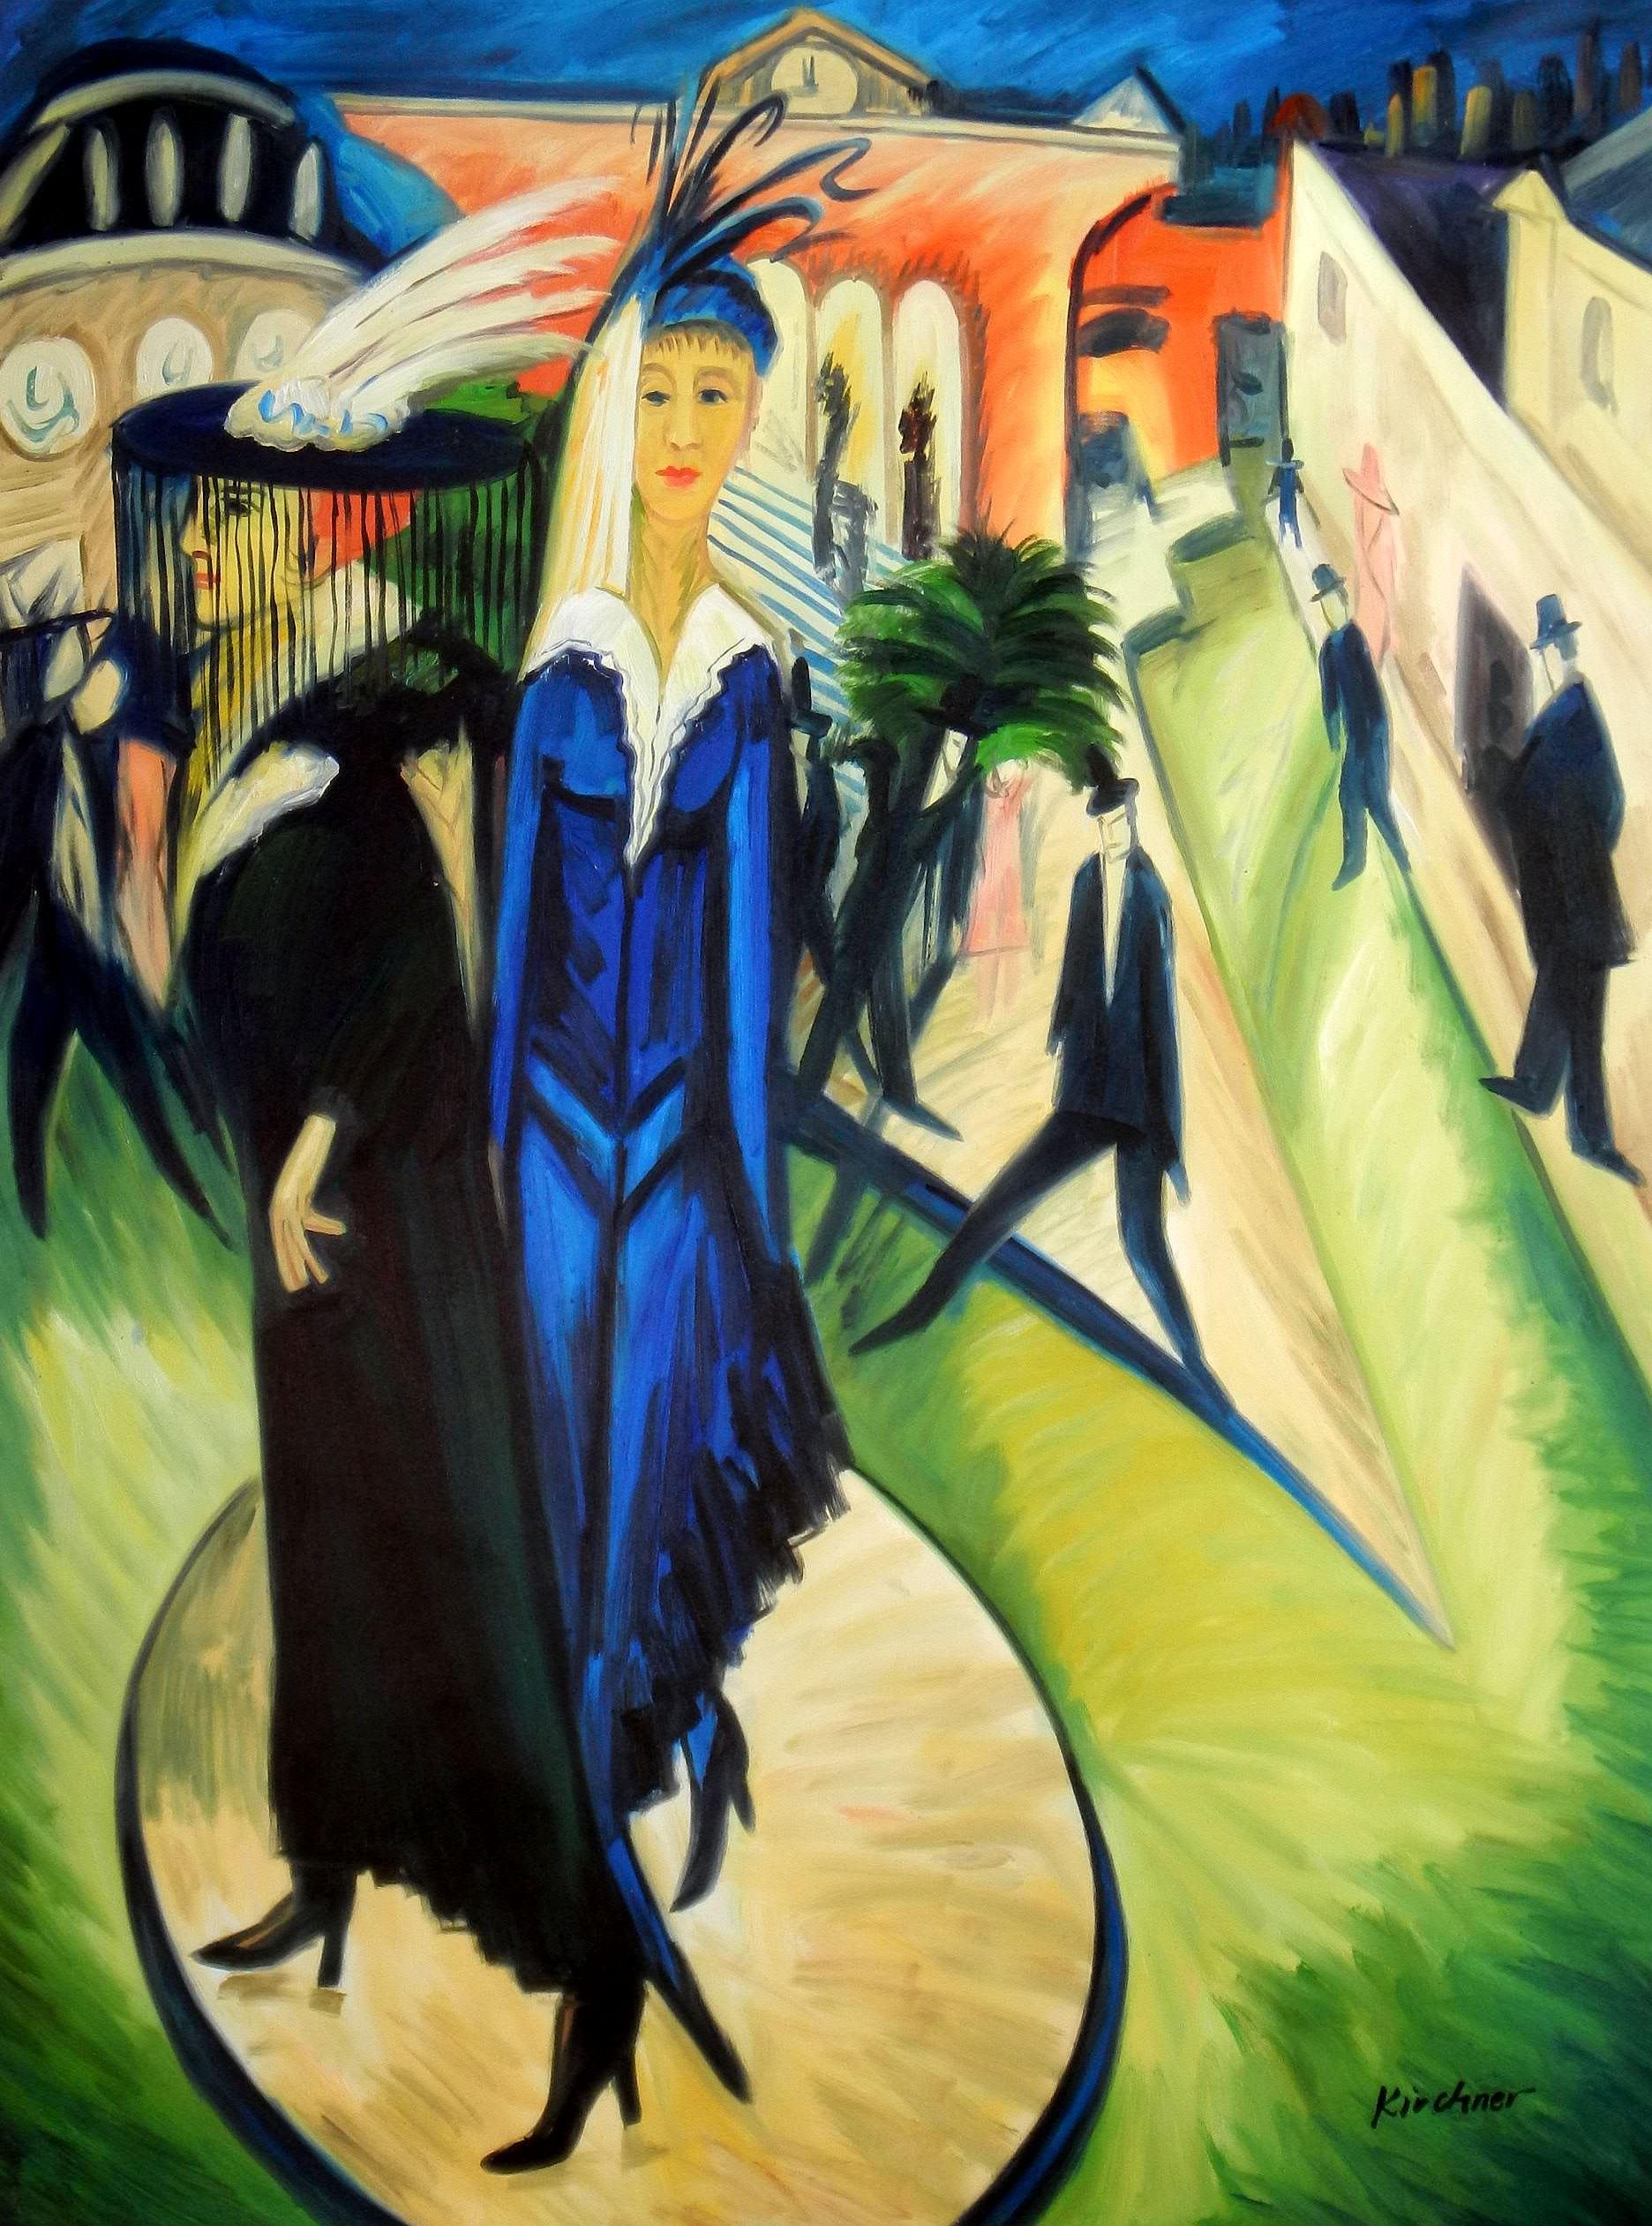 Ernst Ludwig Kirchner - Potsdamer Platz k93794 90x120cm exquisites Ölbild